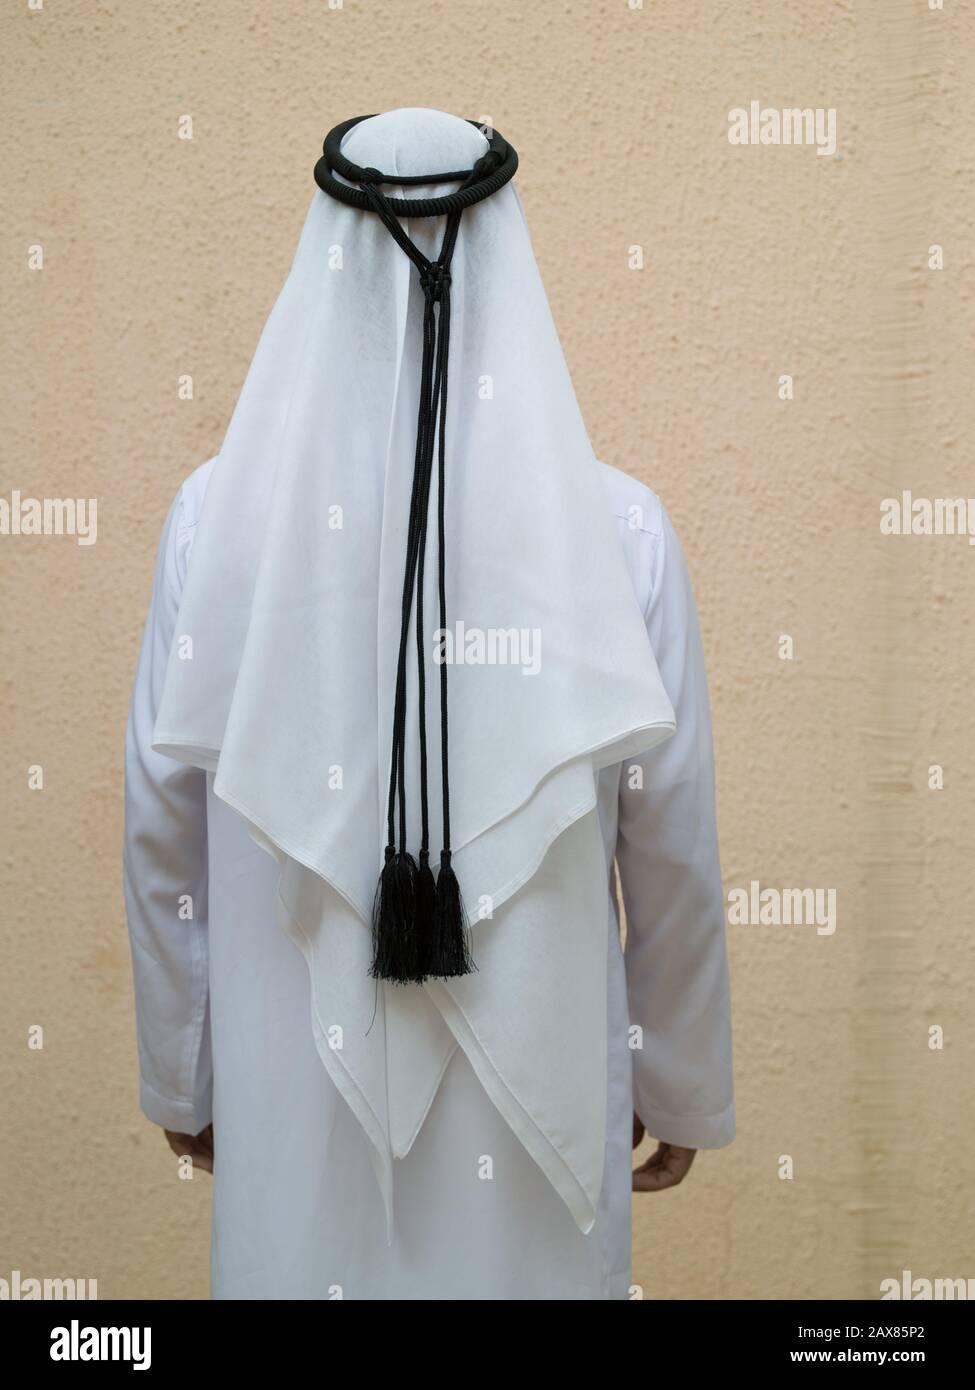 Arab male in Kandura. Dubai, UAE. Stock Photo